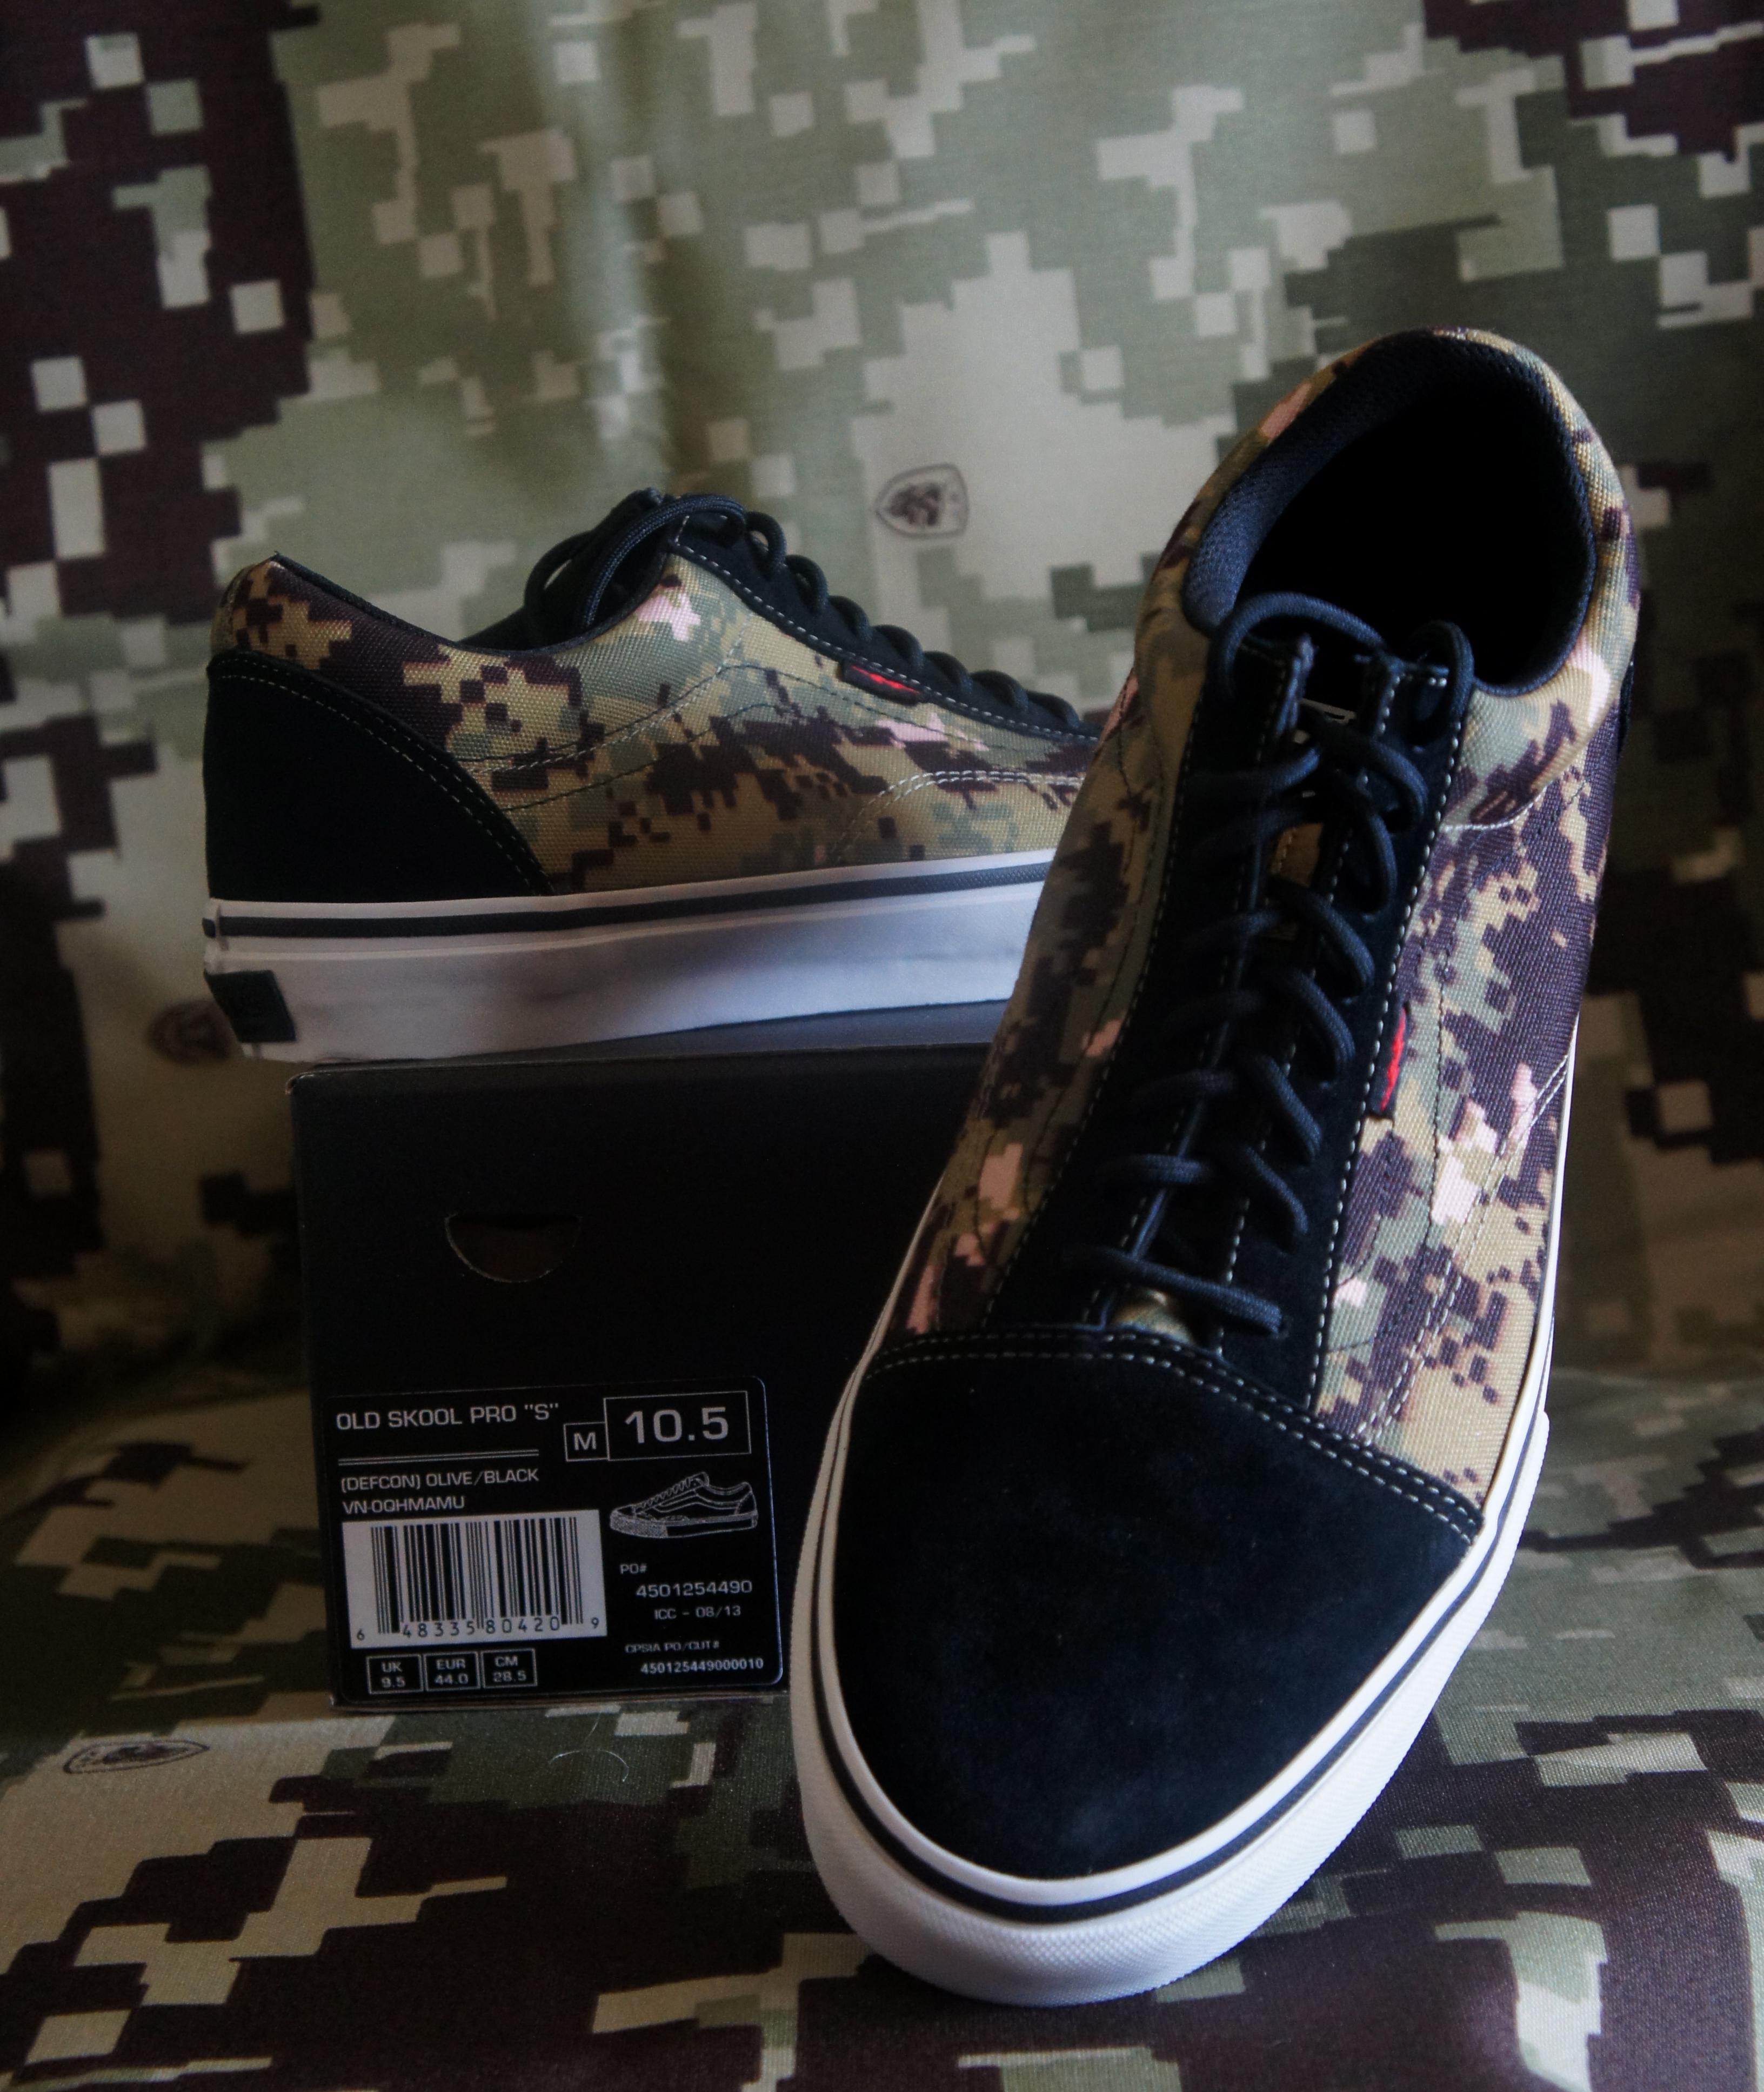 82f8e5a229 Shoes « Tactical Fanboy